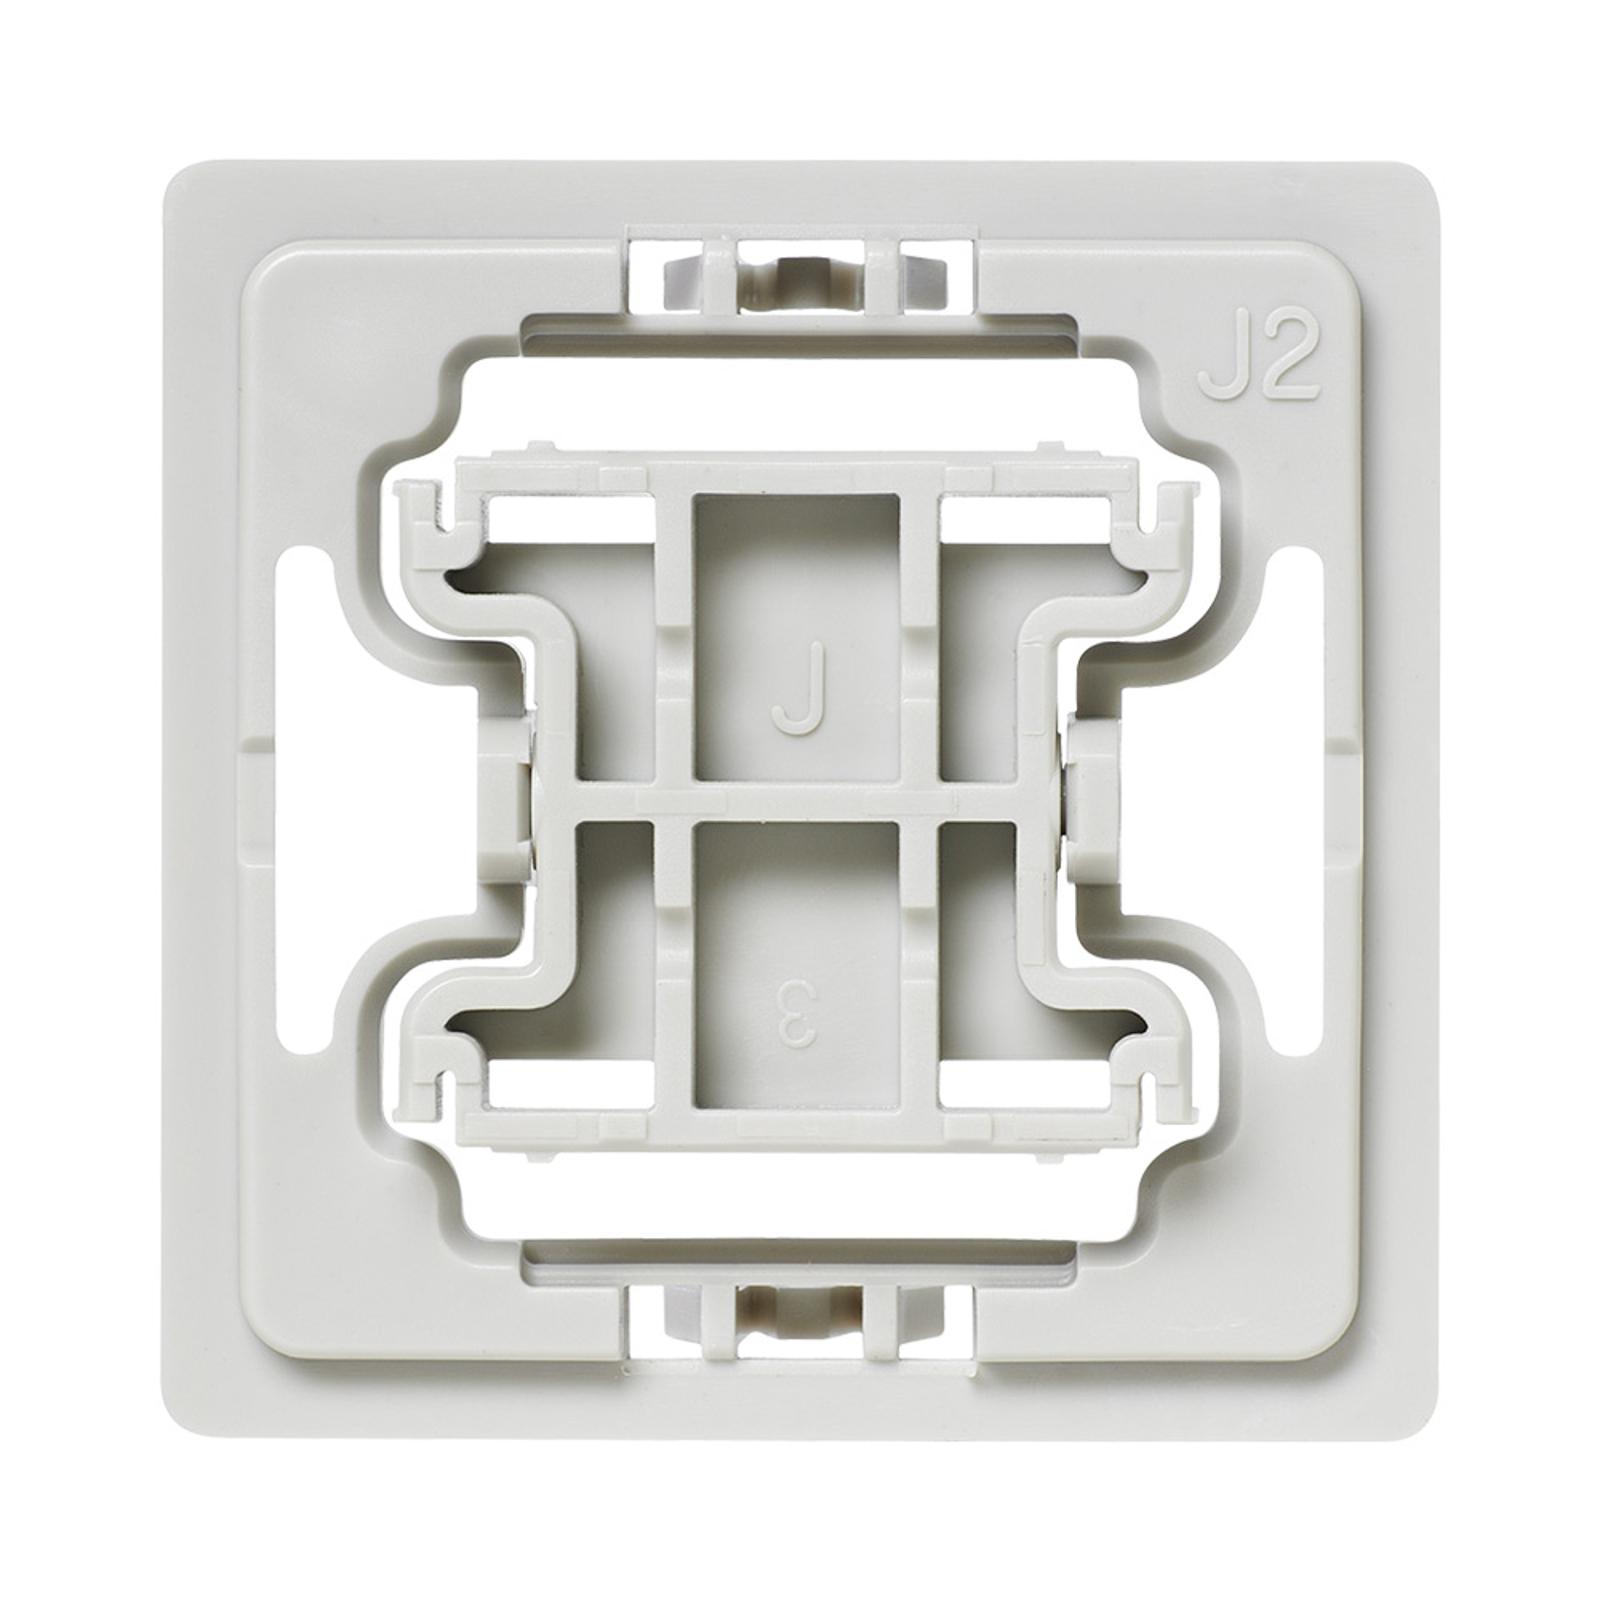 Homematic IP Adapter für Jung Schalter J2 1x